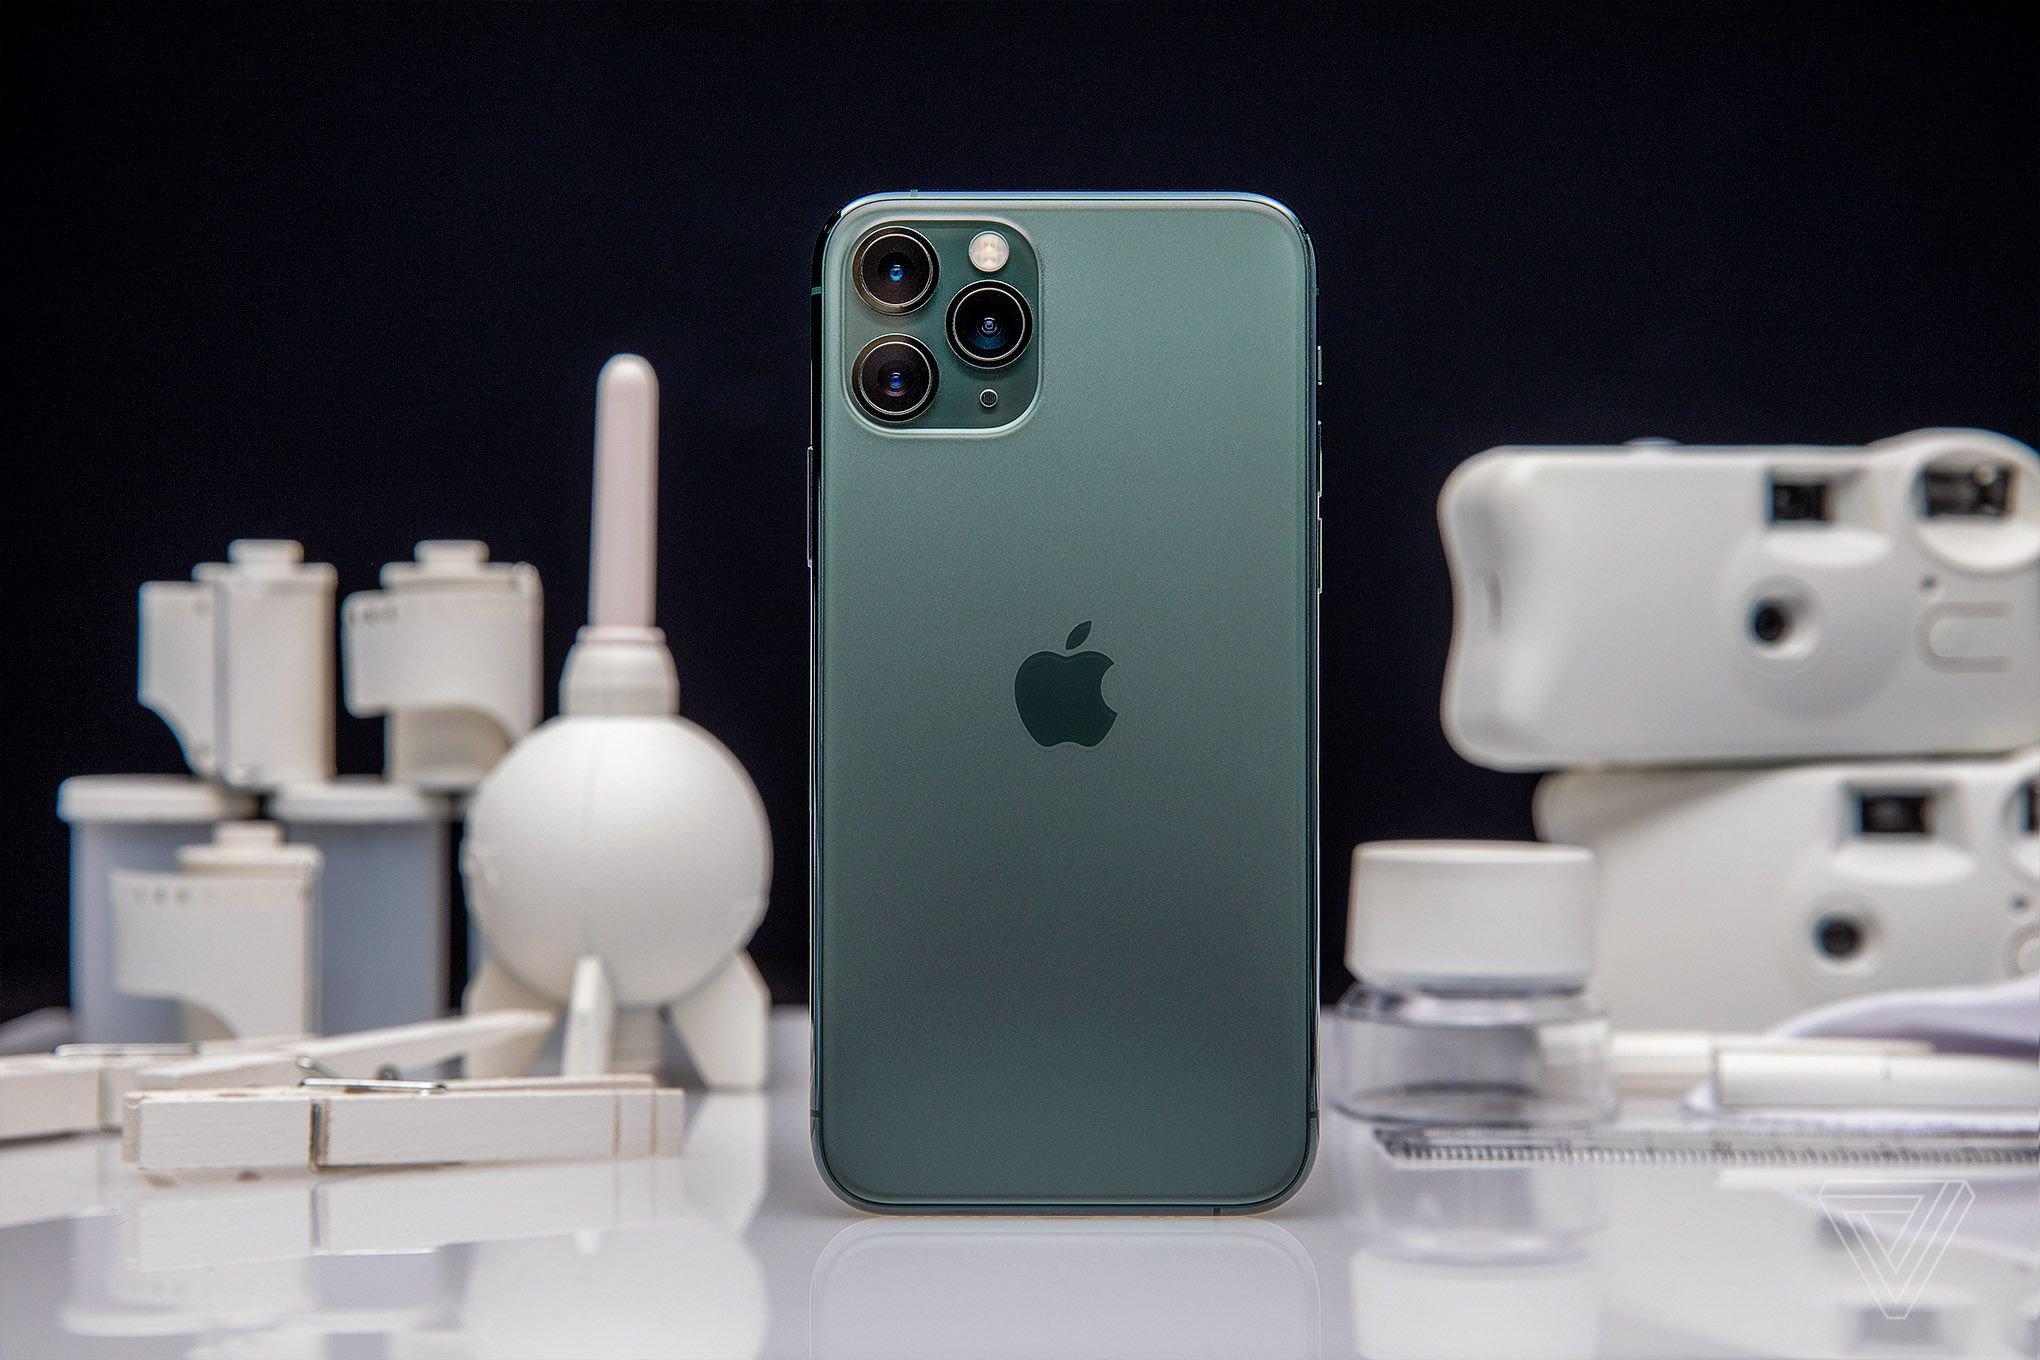 айфон 11 про 512 темно-зеленый